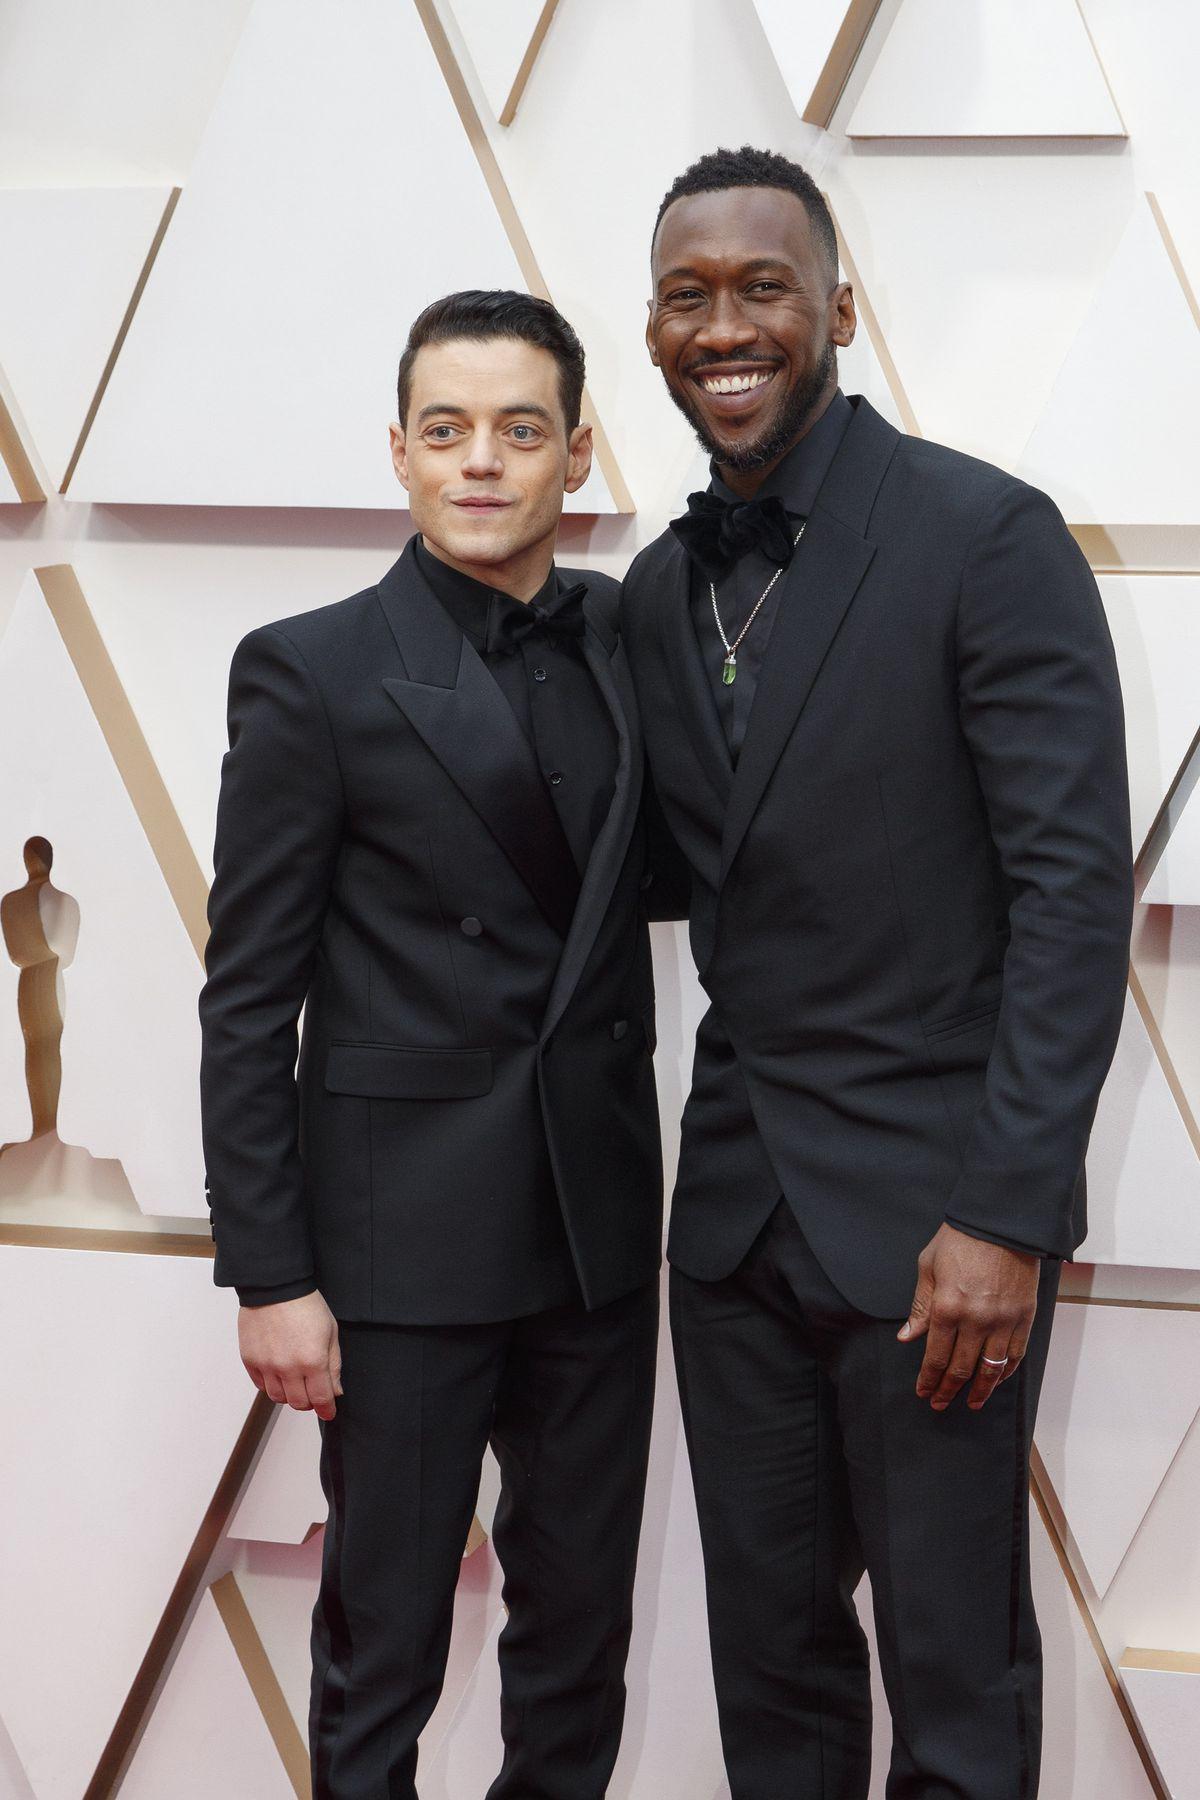 Mahershala Ali and Rami Malek on the Oscars red carpet.